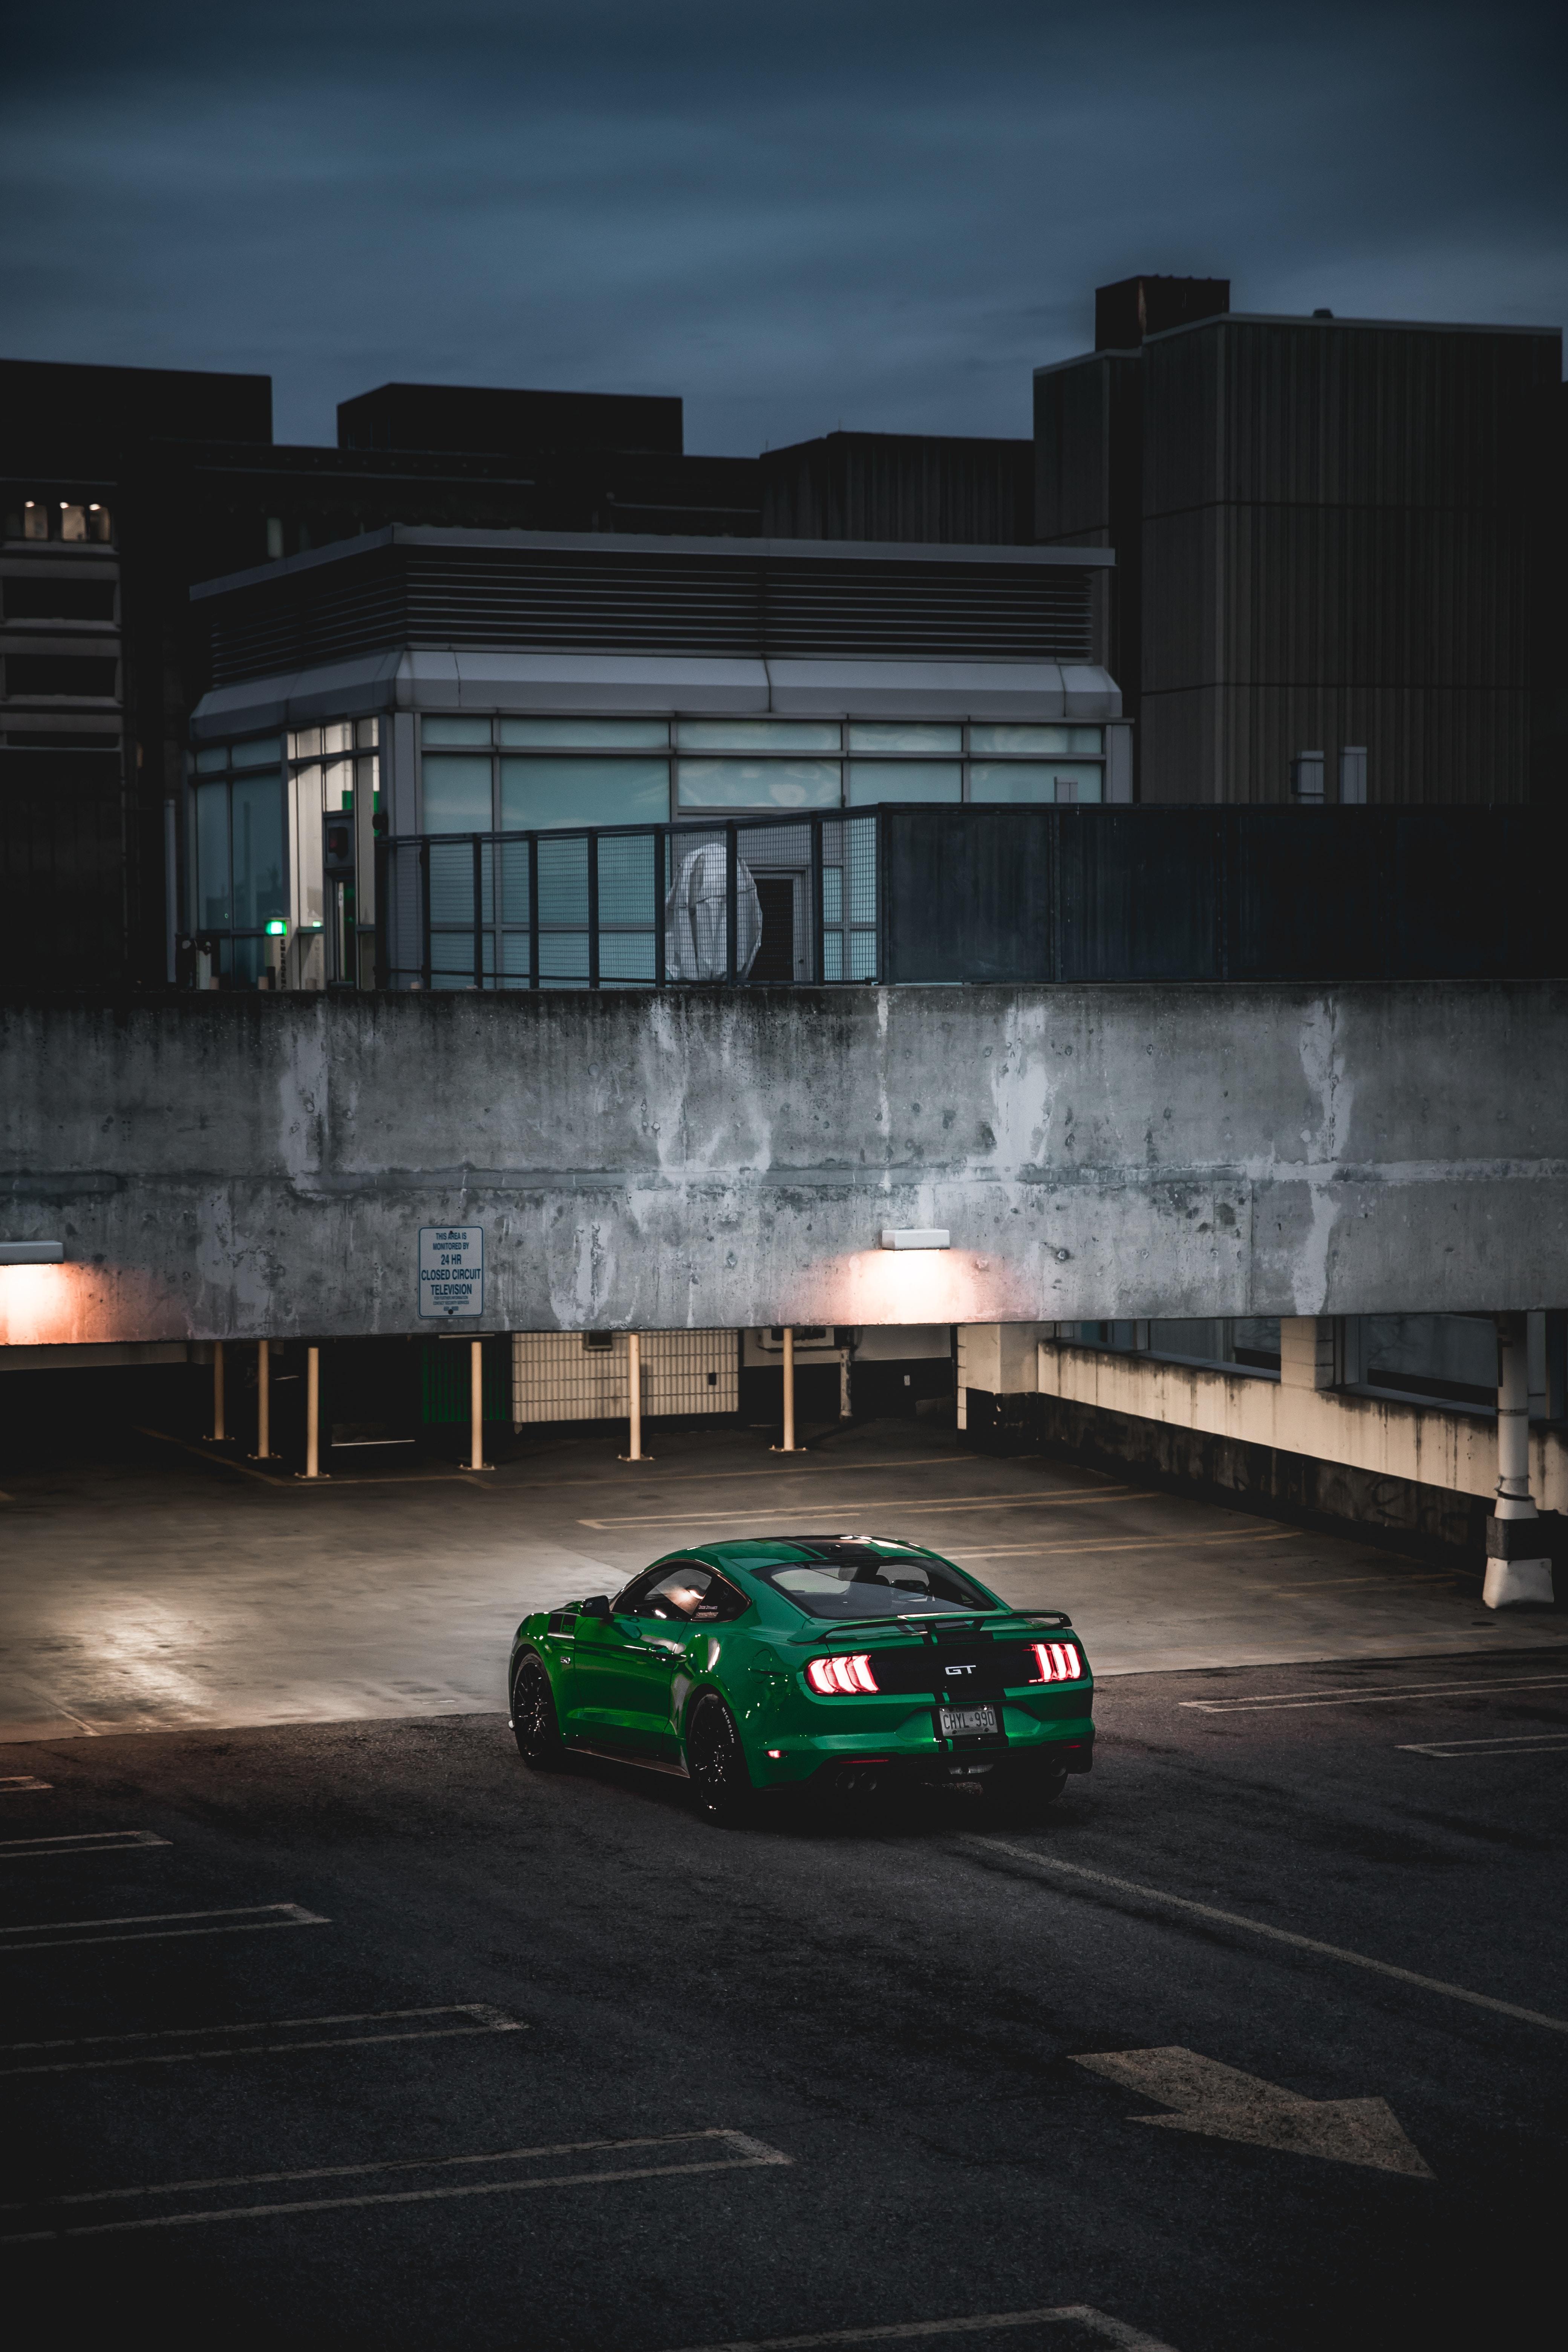 135533 скачать обои Форд (Ford), Тачки (Cars), Машина, Спорткар, Зеленый, Парковка, Ford Mustang - заставки и картинки бесплатно